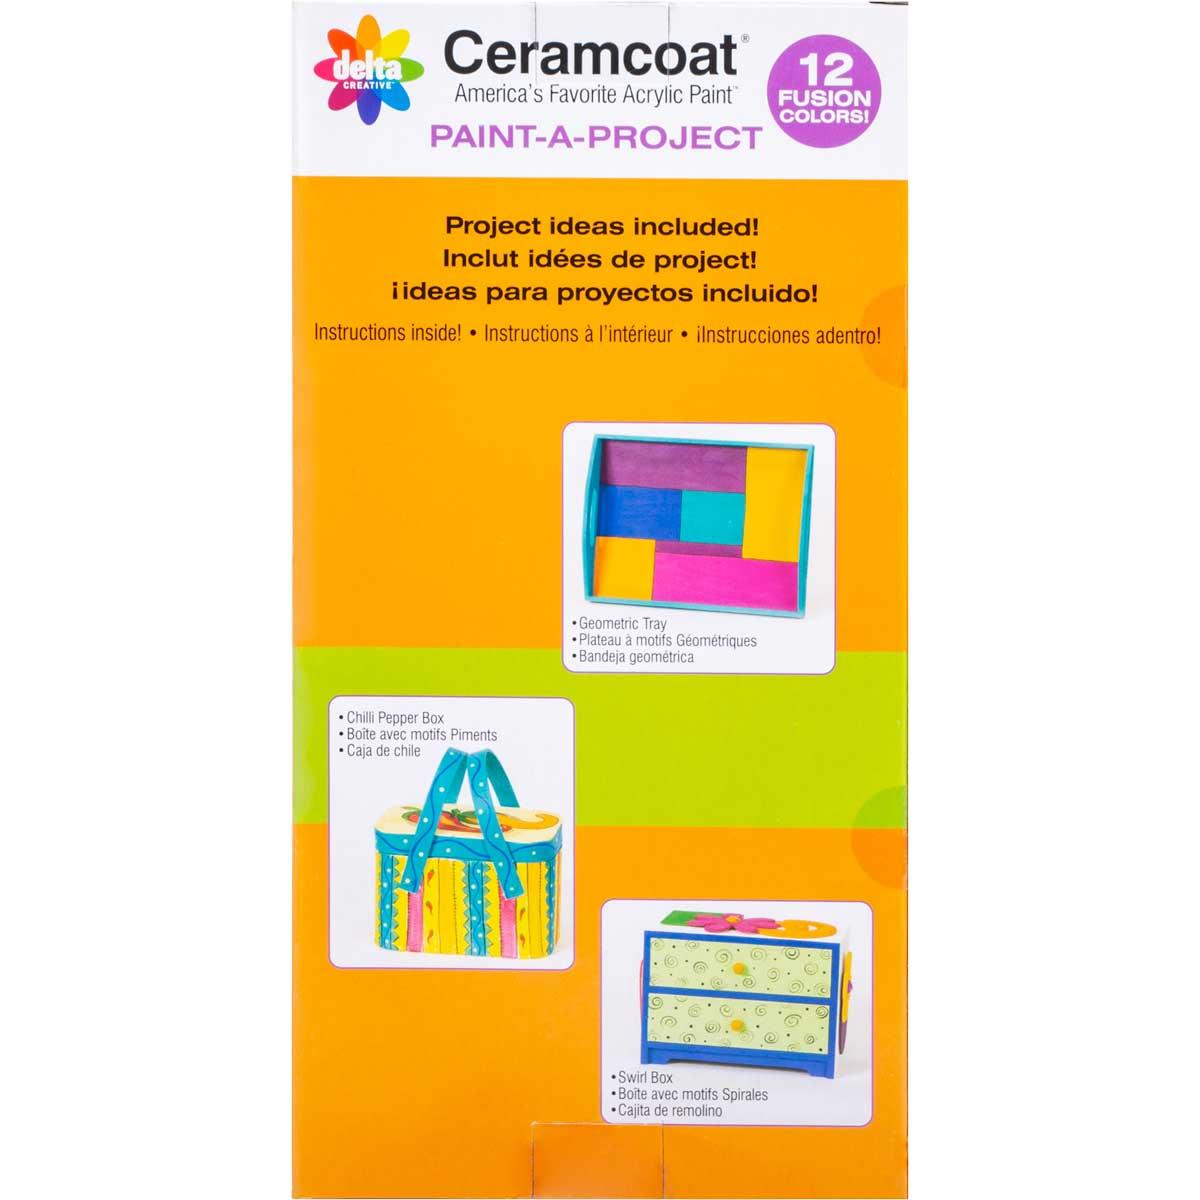 Delta Ceramcoat ® Paint-A-Project - Fusion, 12 Colors - 028880056